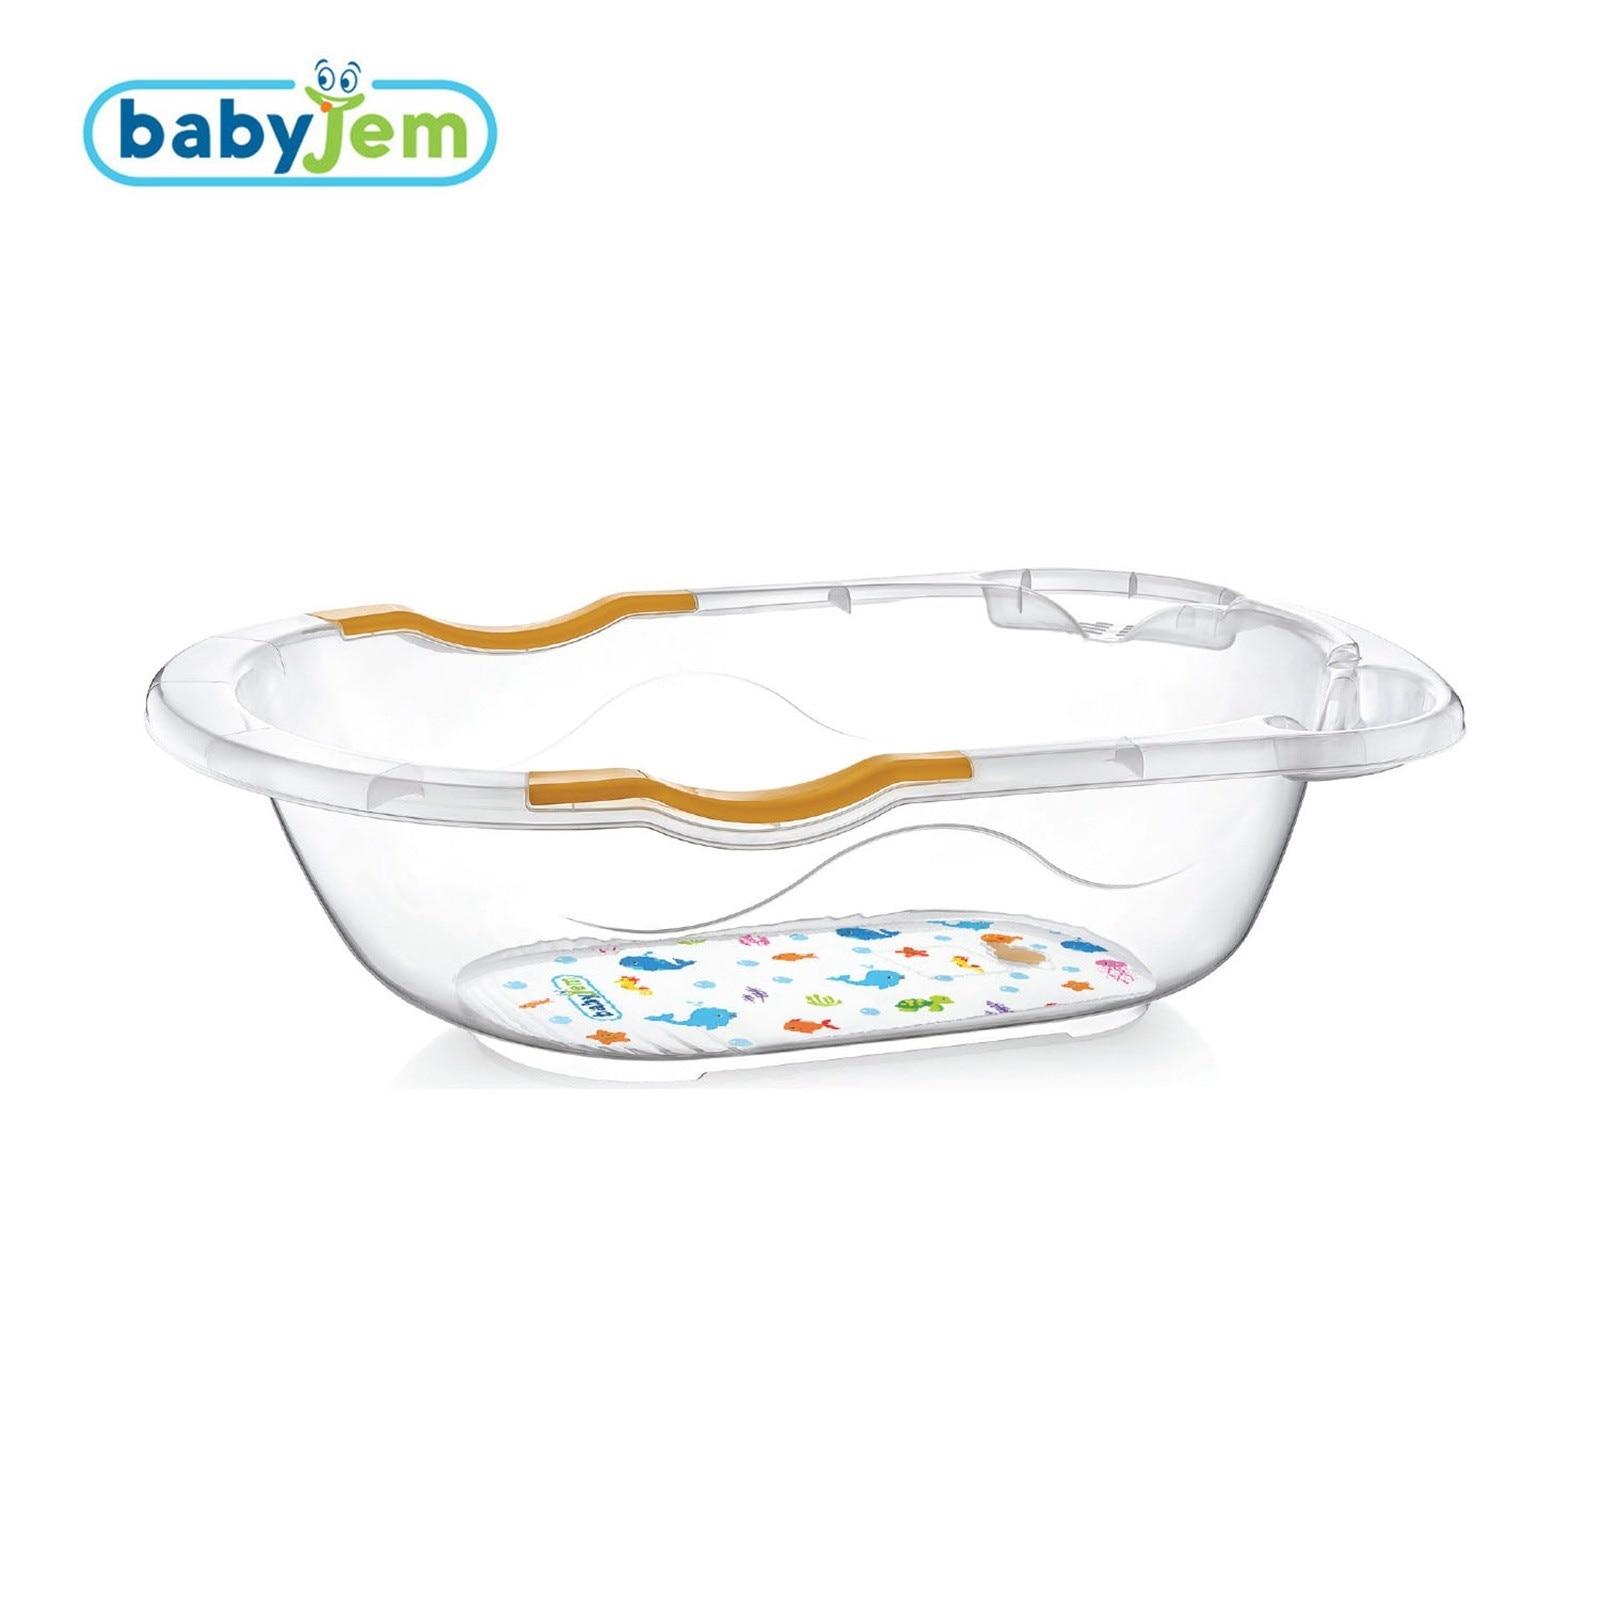 Пластиковая Ванна с прозрачным рисунком ebek Babyjem 35 литров